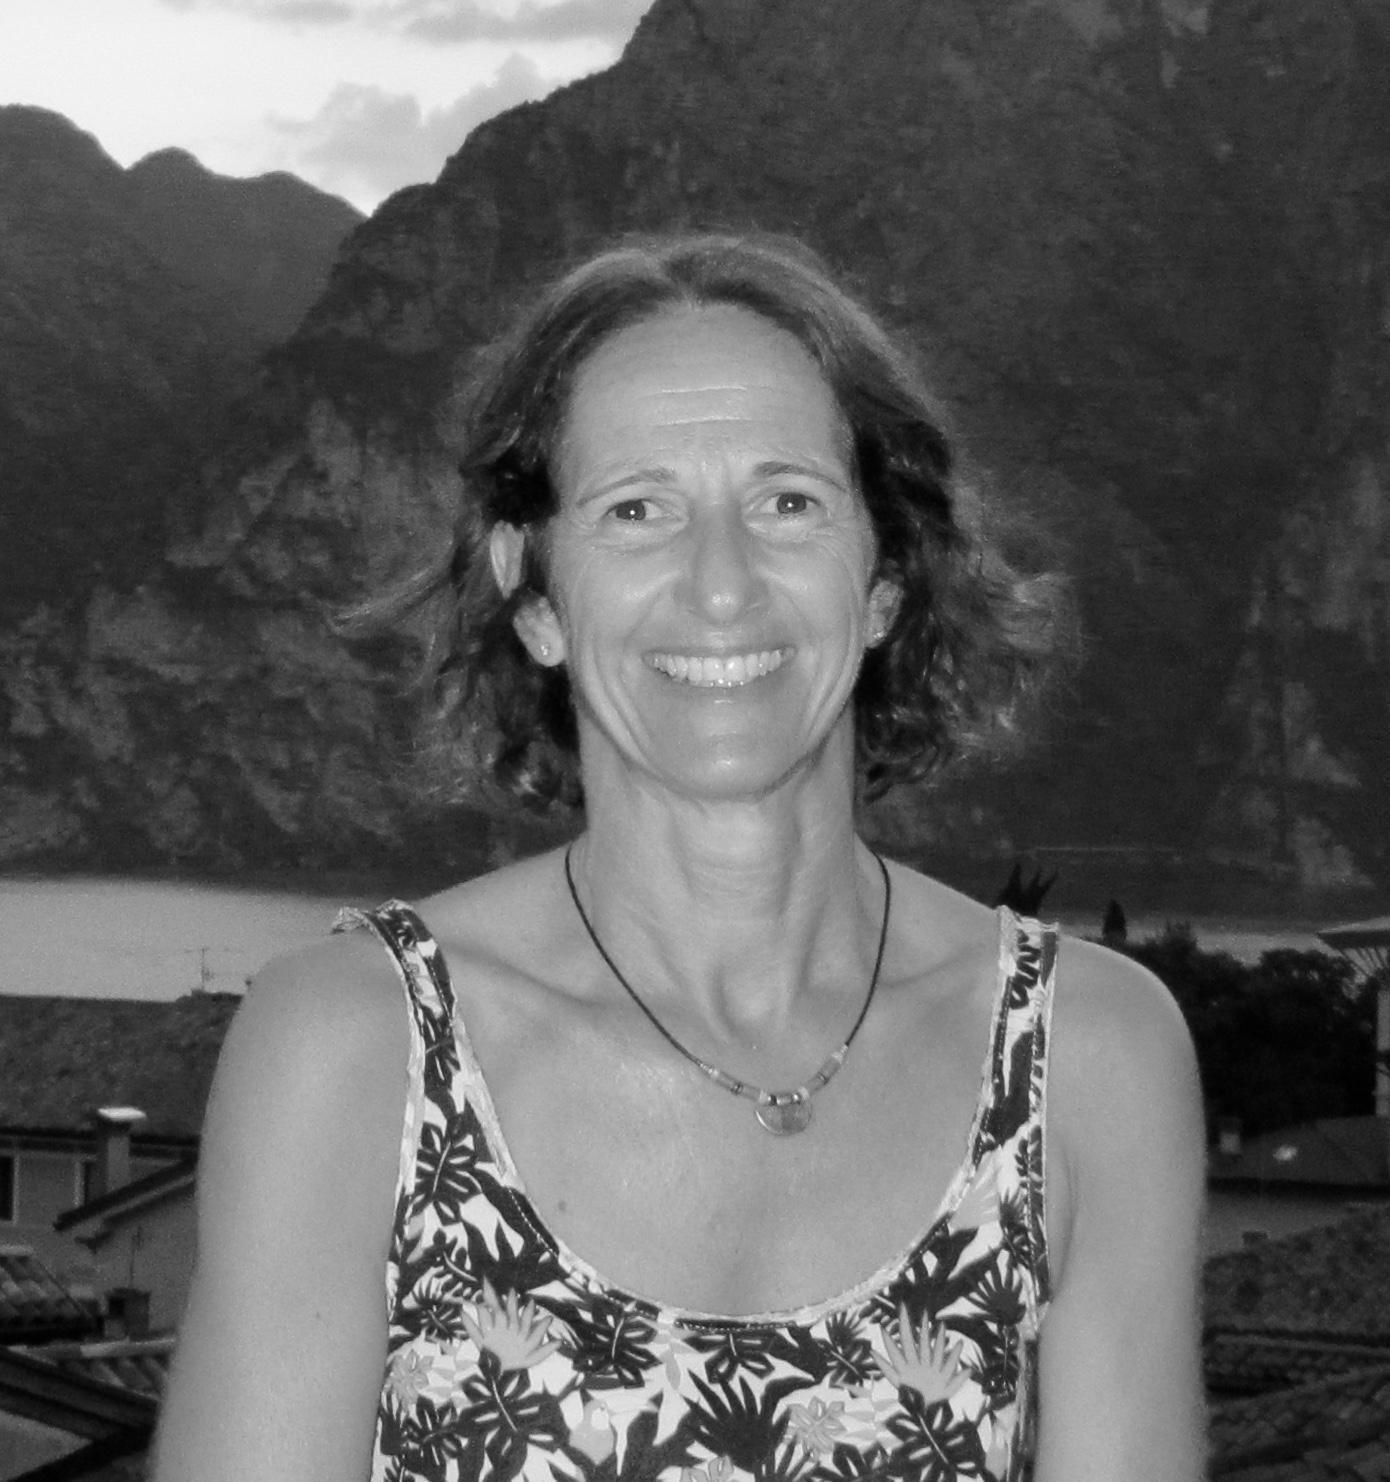 Françoise mathieu-daude